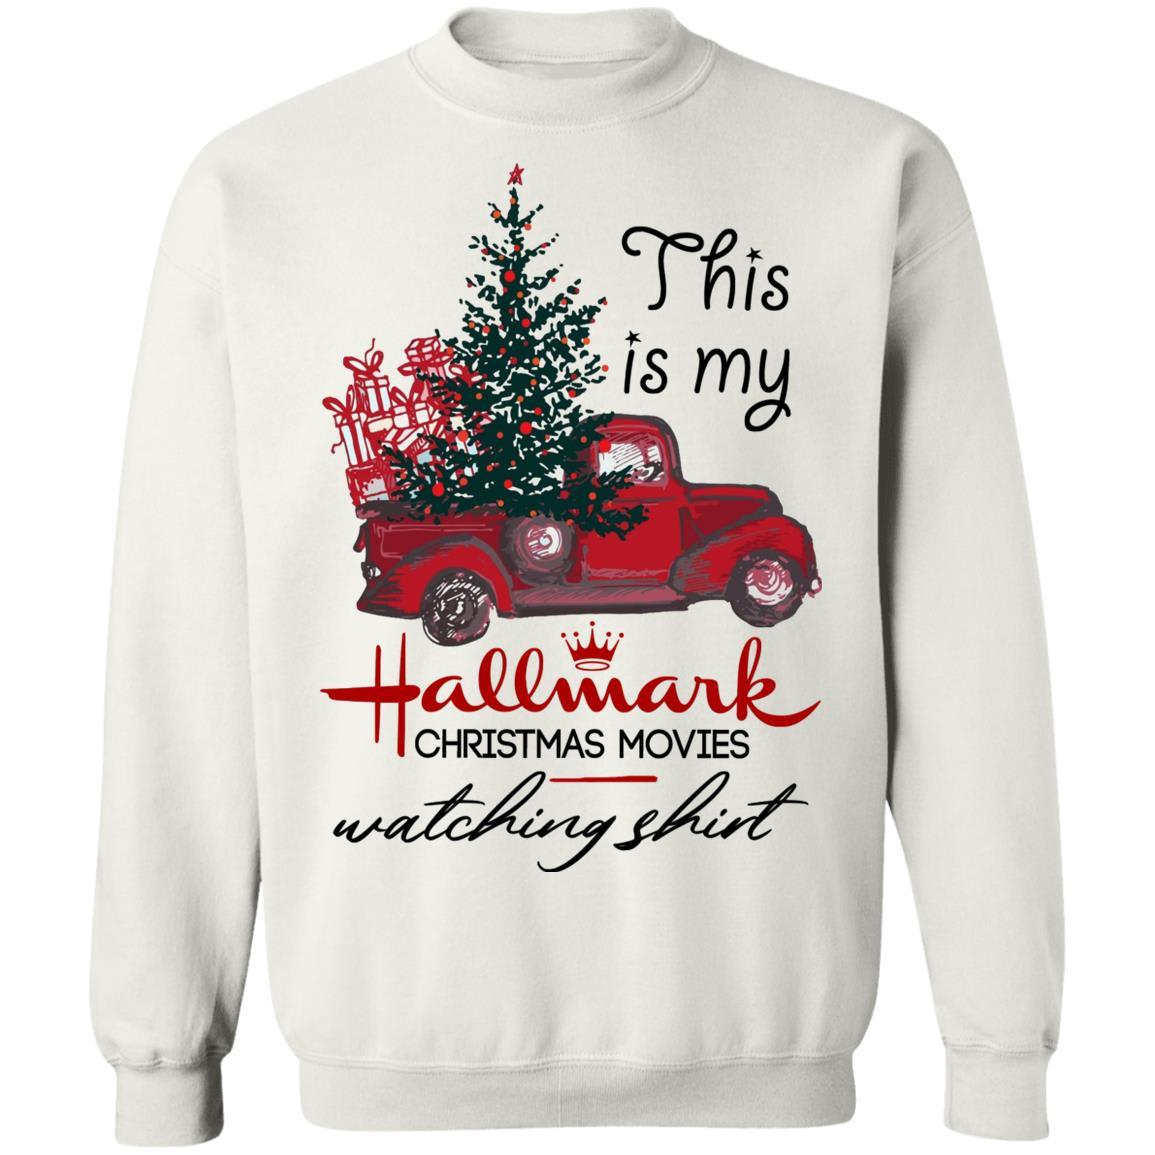 Hallmark Christmas Shirt Svg.Mix This Is My Hallmark Christmas Movie Watching